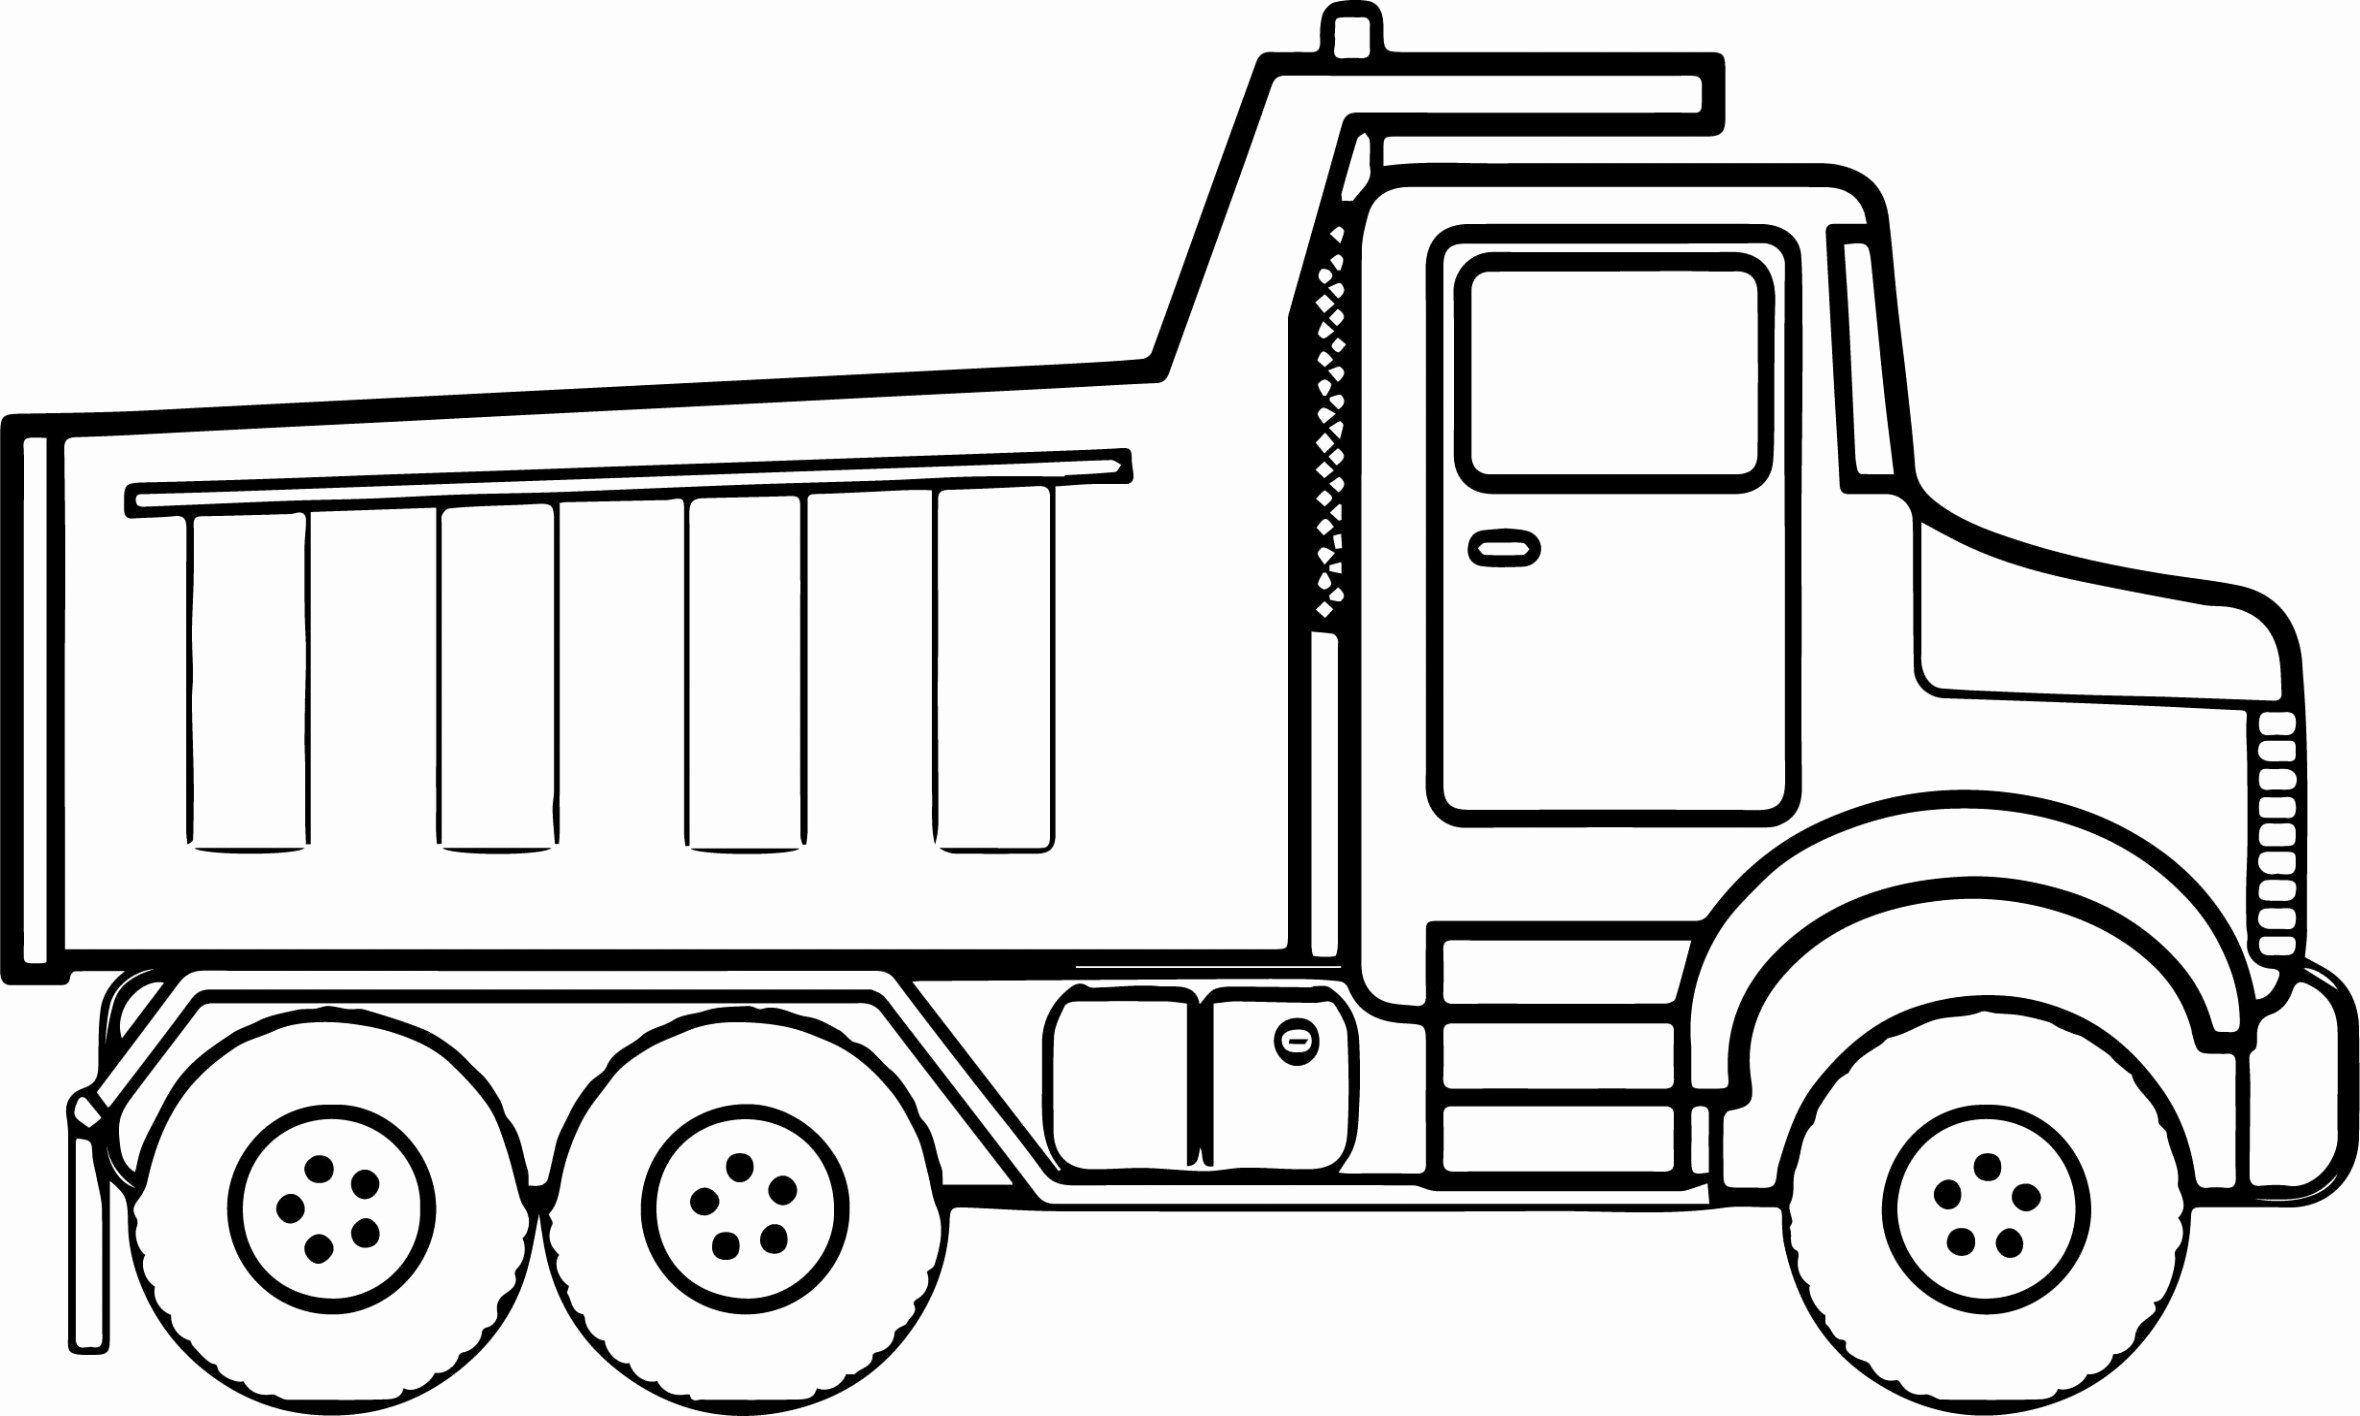 Garbage Truck Coloring Sheet Elegant New Preschool Truck Coloring Sheets Cleanty Buku Mewarnai Warna Truk